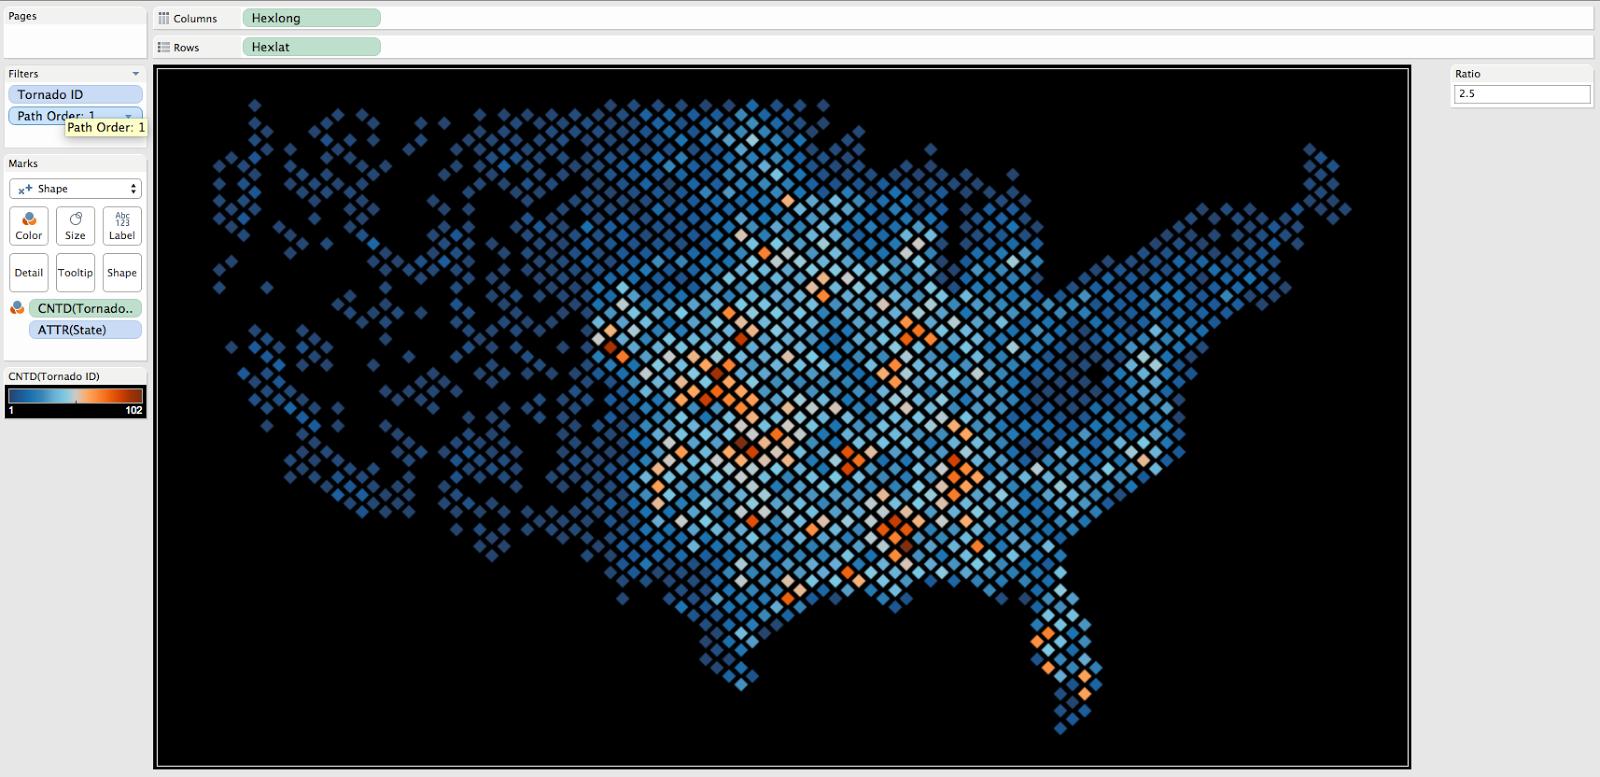 How to create density maps using hexbins in Tableau